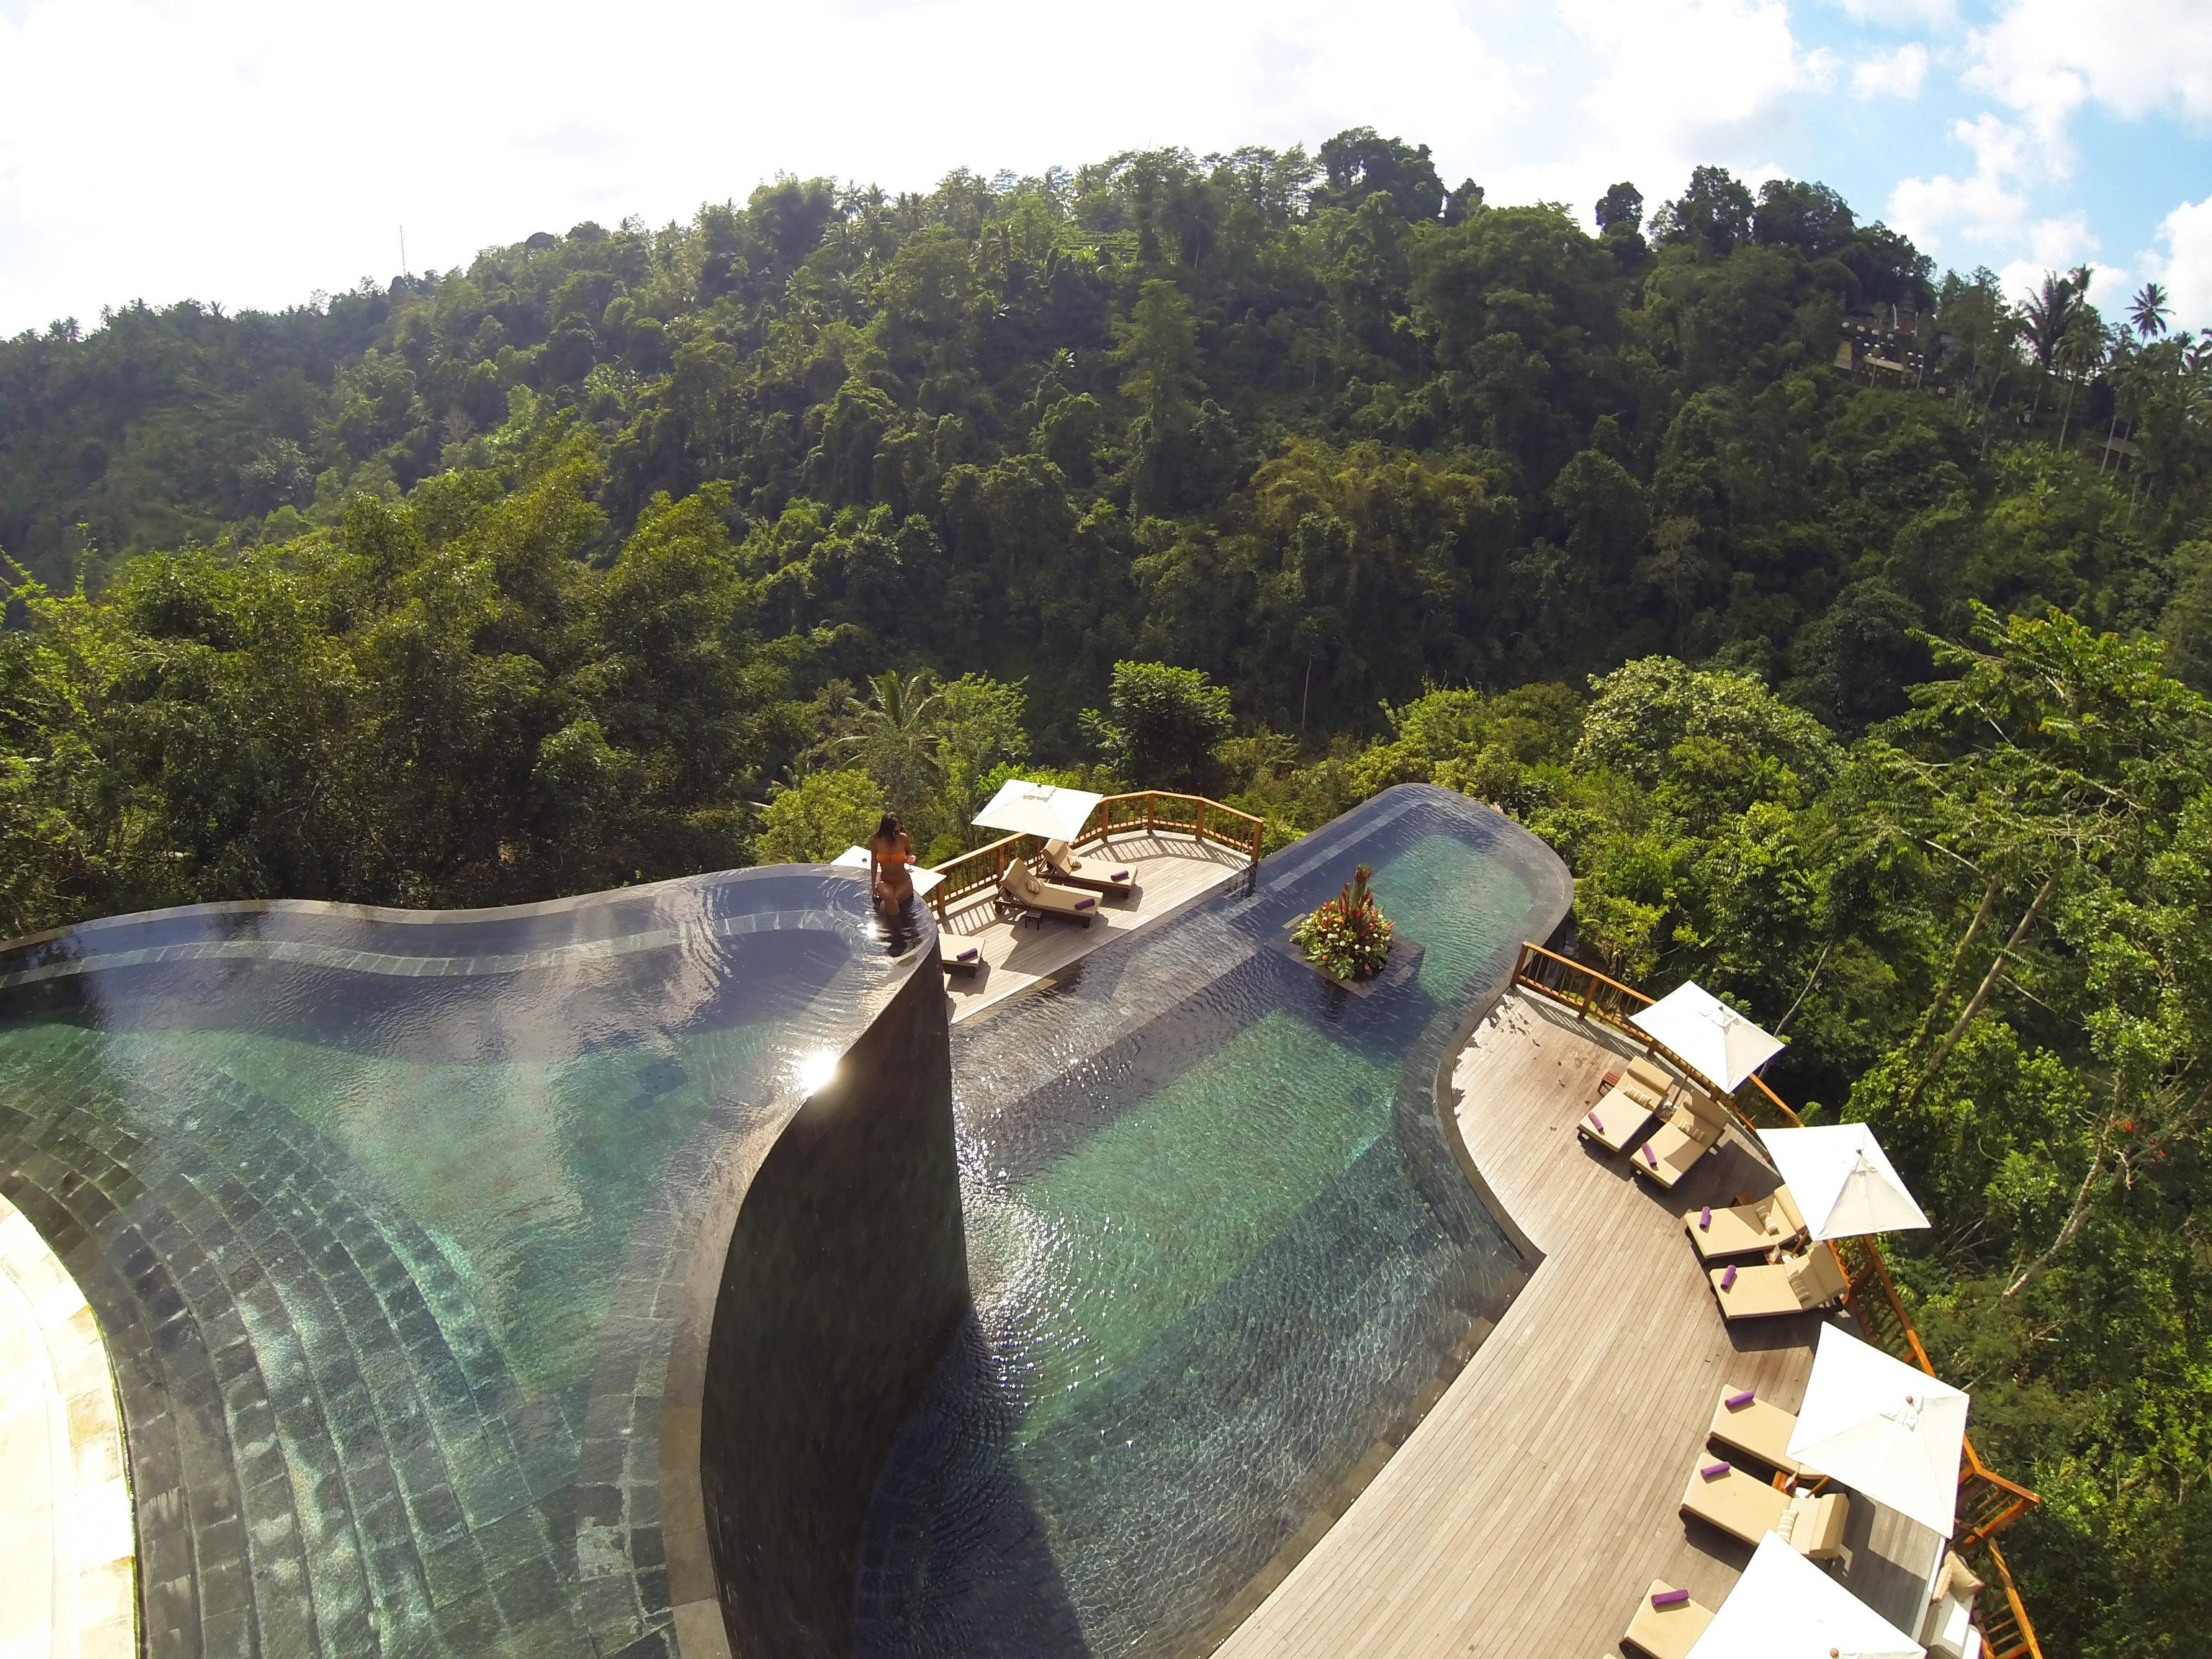 Hotels Tree Sky Outdoor Water Vacation Tourism Waterway Reservoir